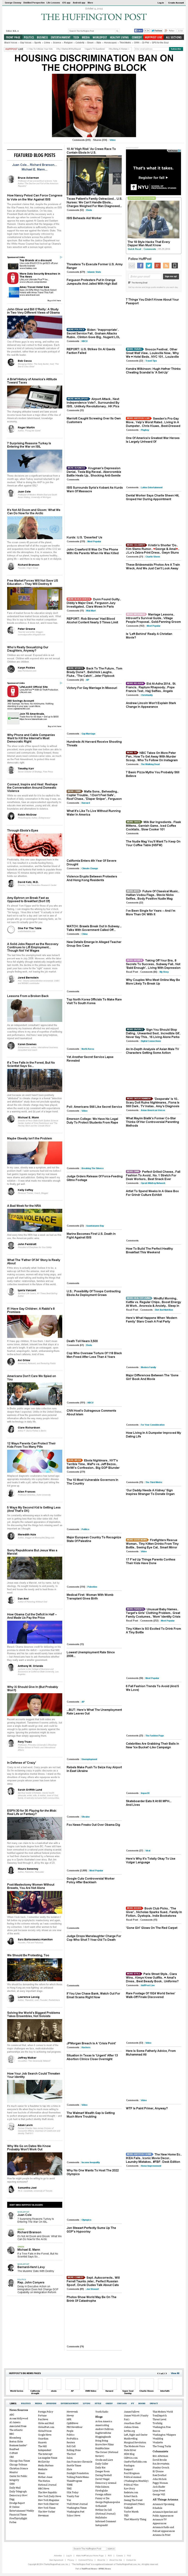 The Huffington Post at Saturday Oct. 4, 2014, 10:08 a.m. UTC